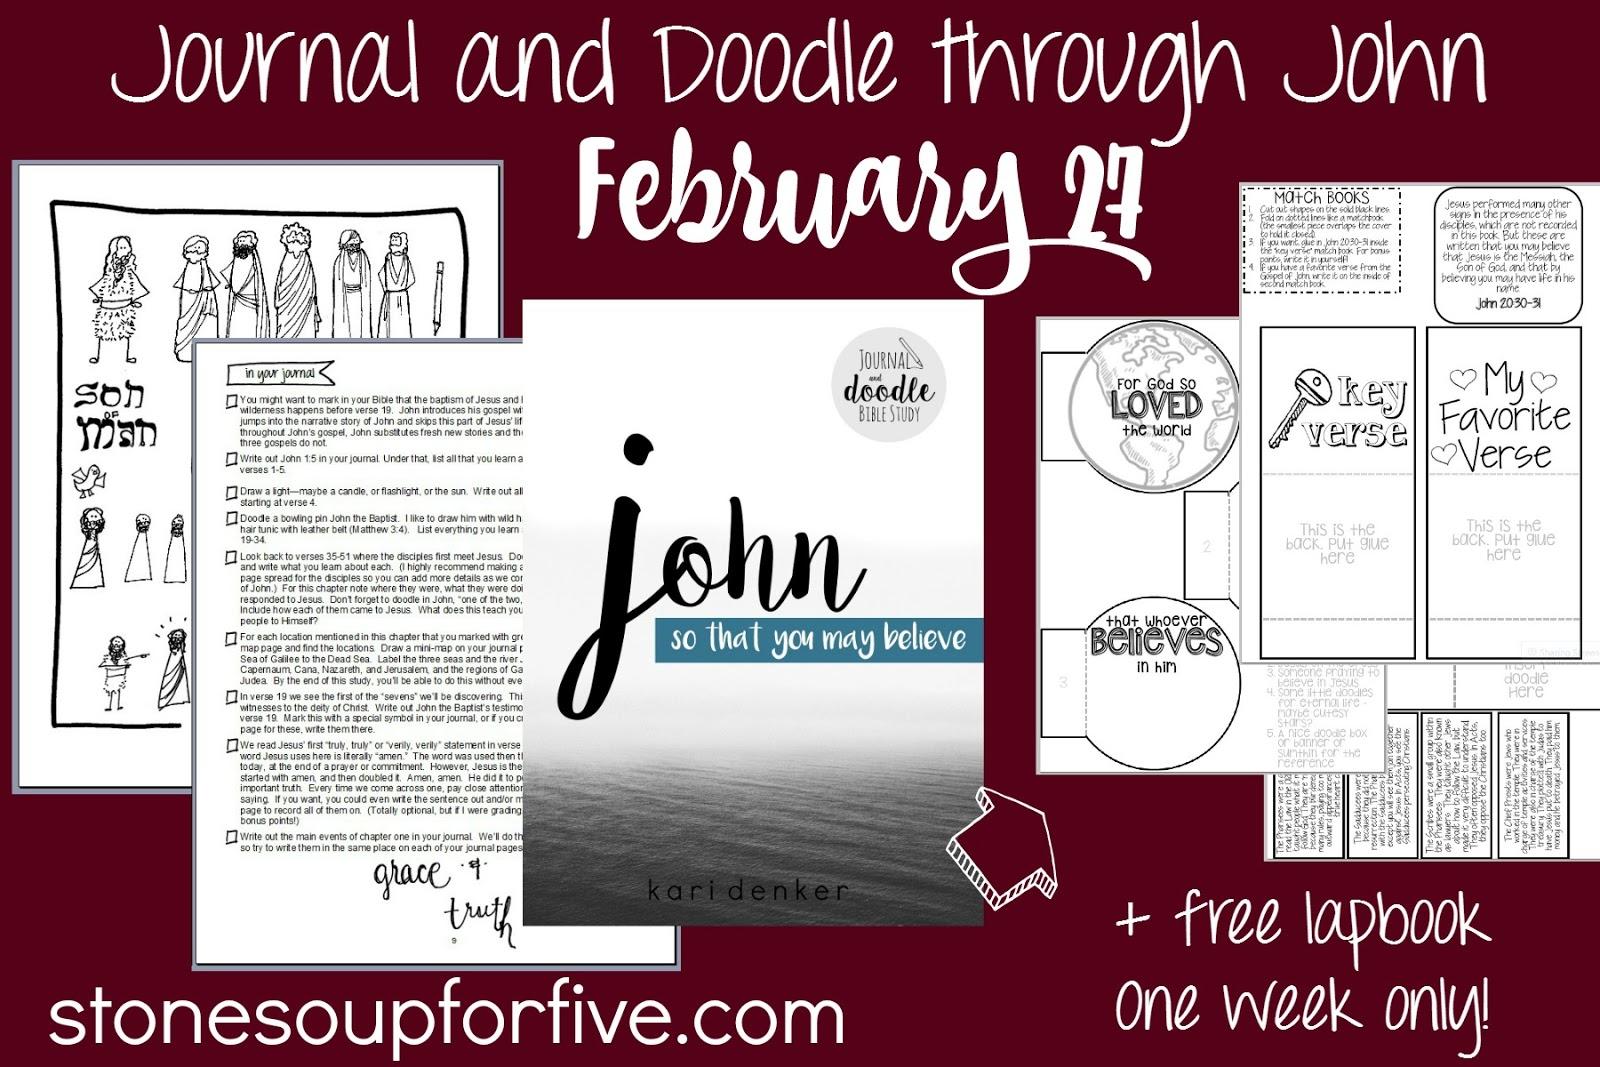 Stone Soup for Five: Coming SOON! Bible study through John